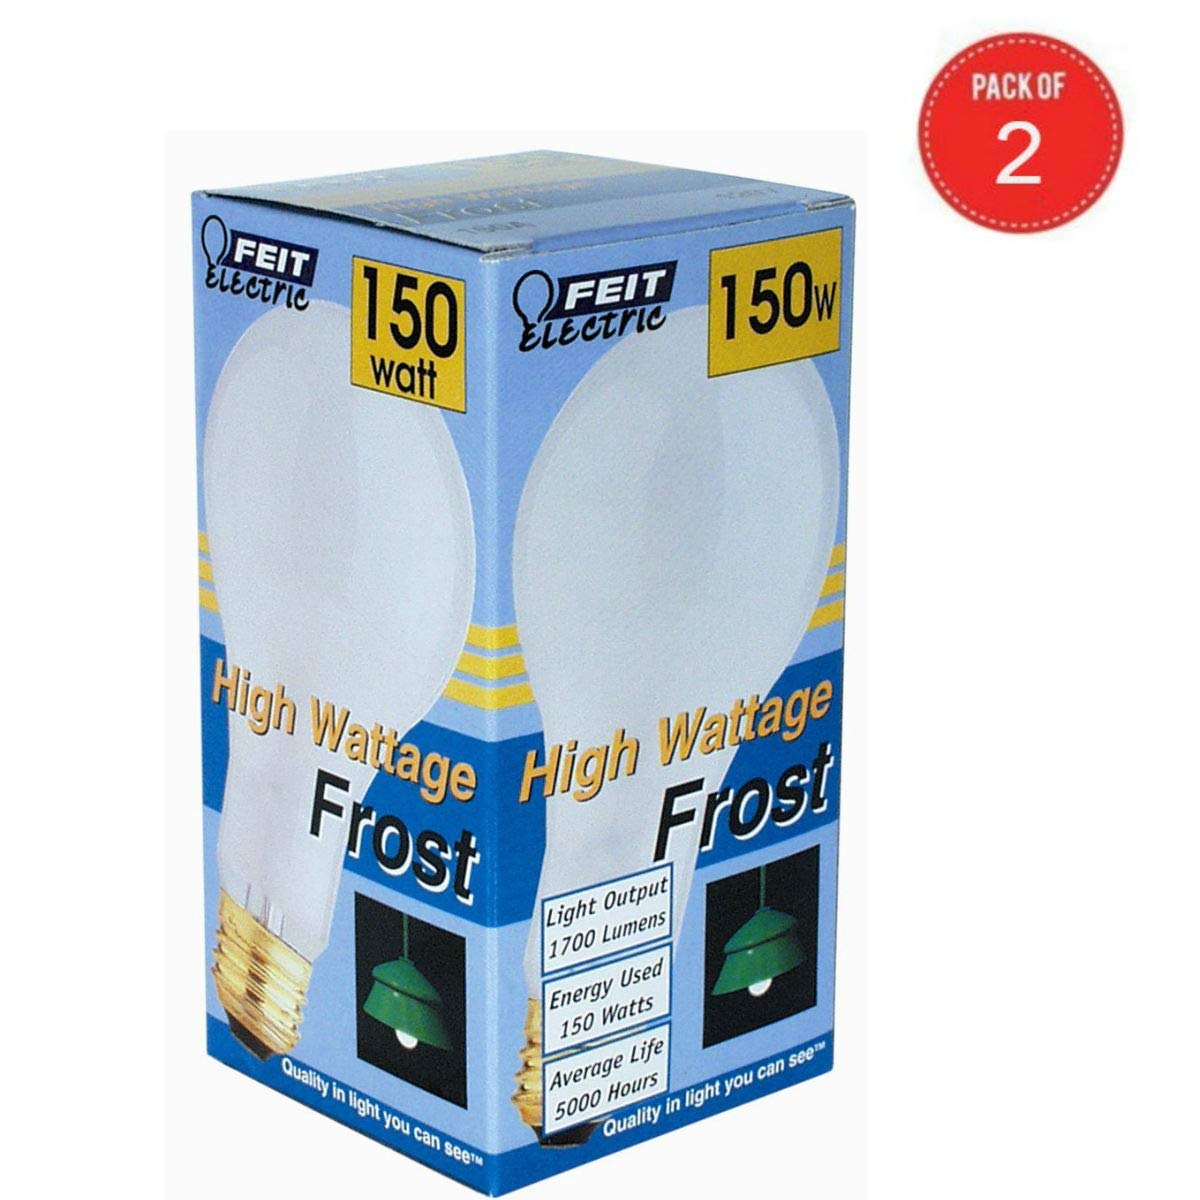 Feit Electric 150A 150-Watt Incandescent A21 Bulb (Pack of 2)